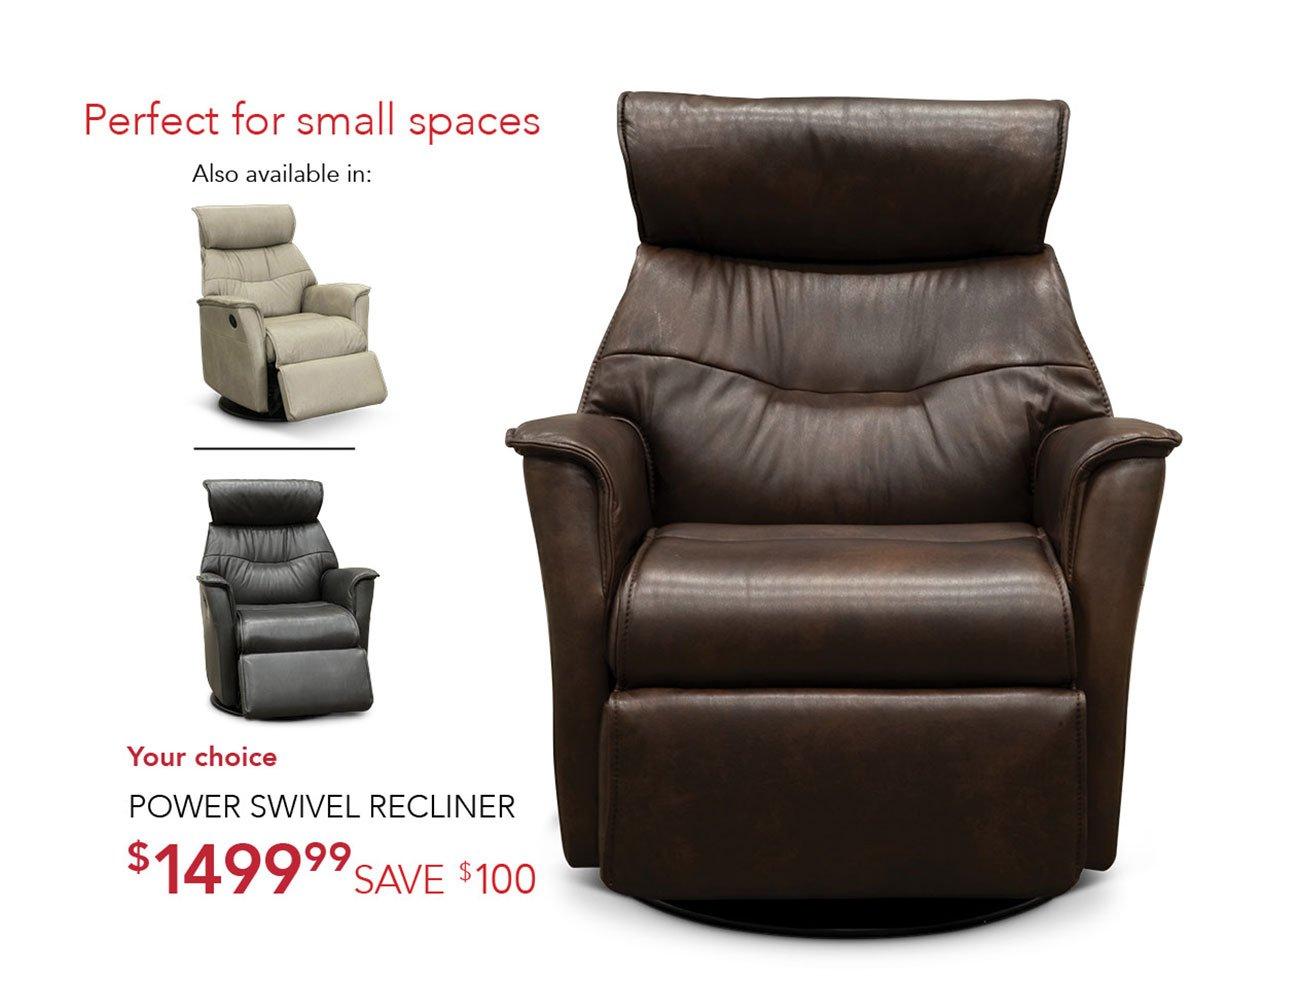 power-swivel-recliner